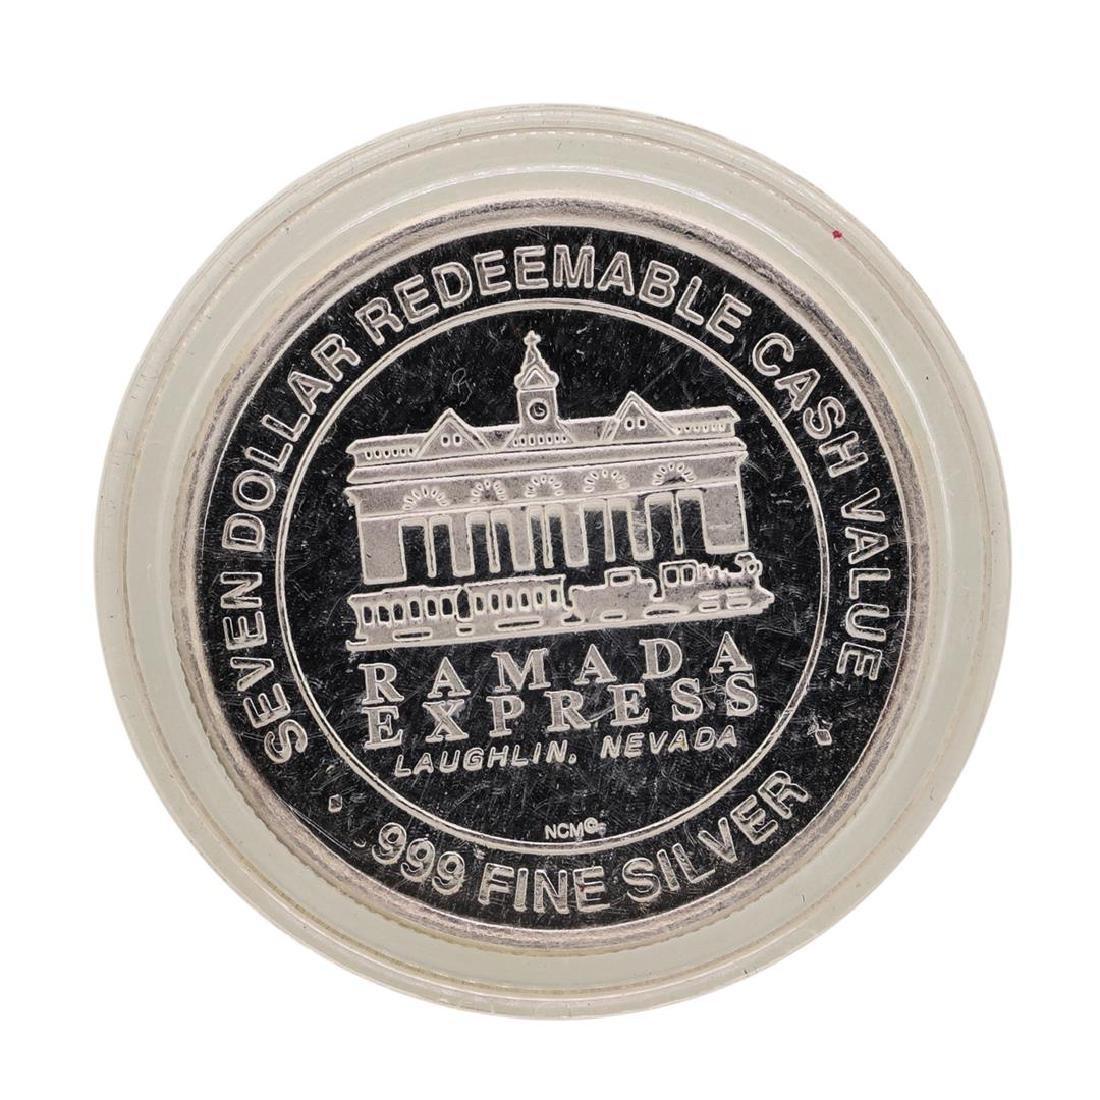 .999 Silver Ramada Express Laughlin, NV $7 Redeemable